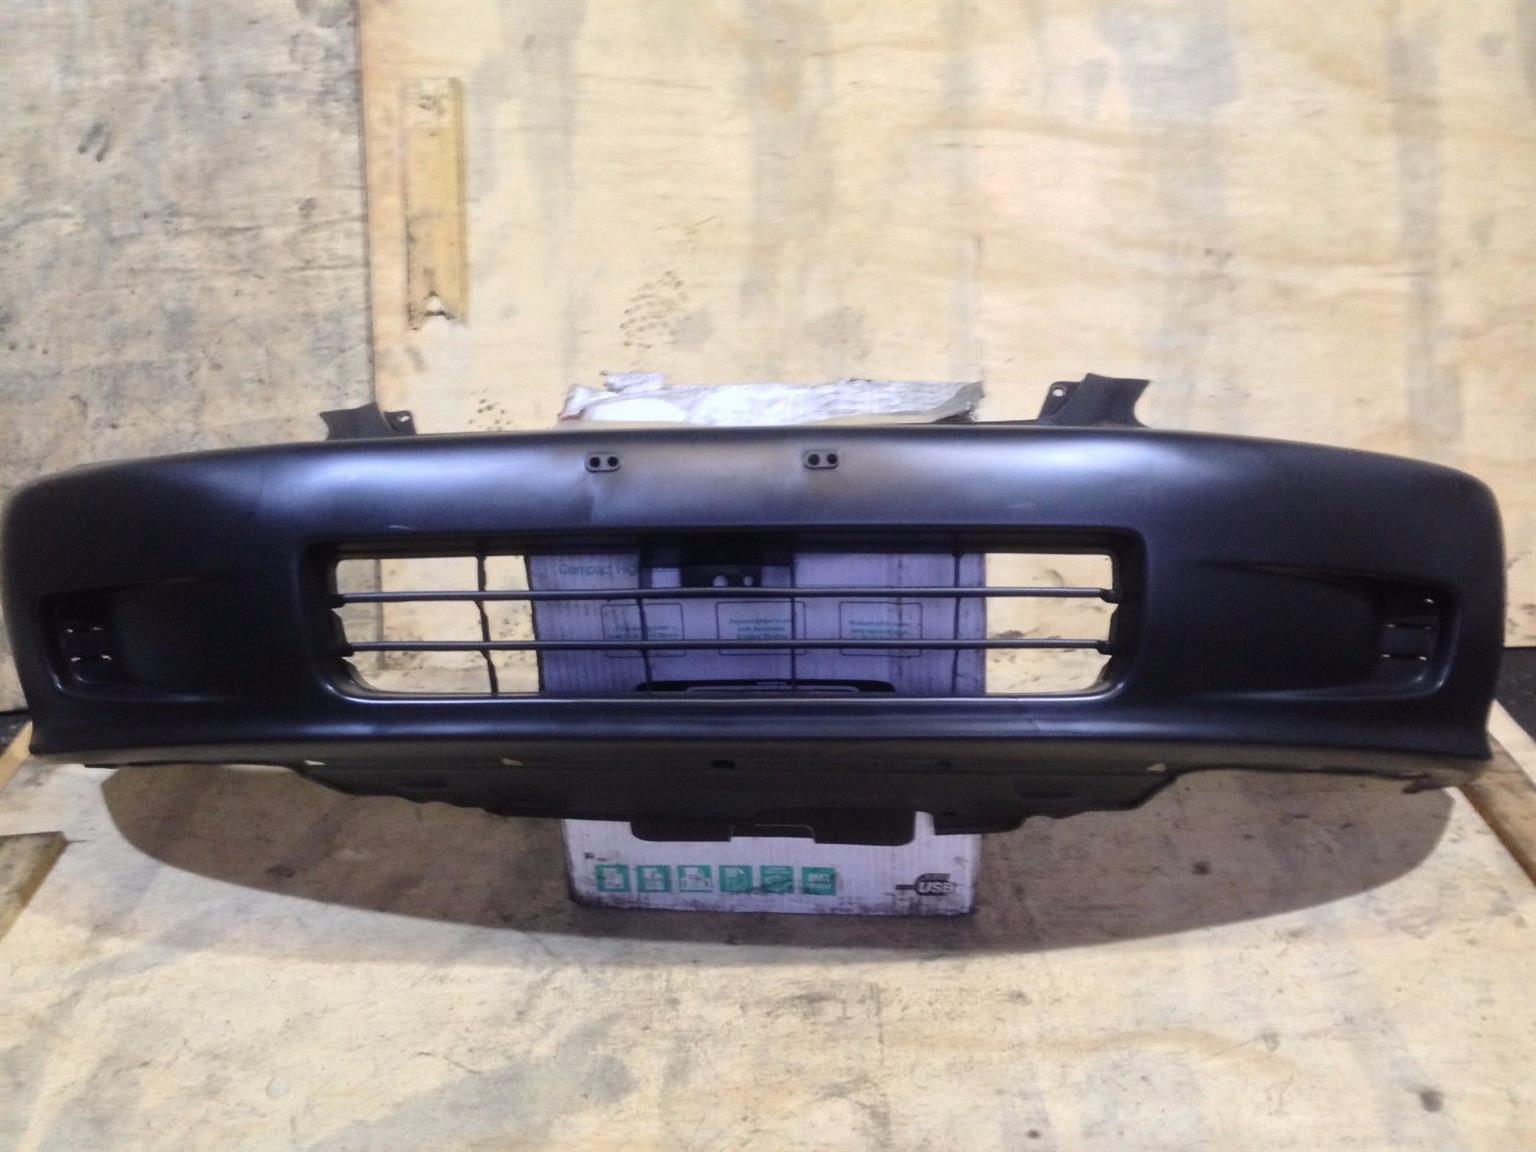 HONDA BALLADE SEDAN 98/2000 Brand New Front Bumpers for sale price R650